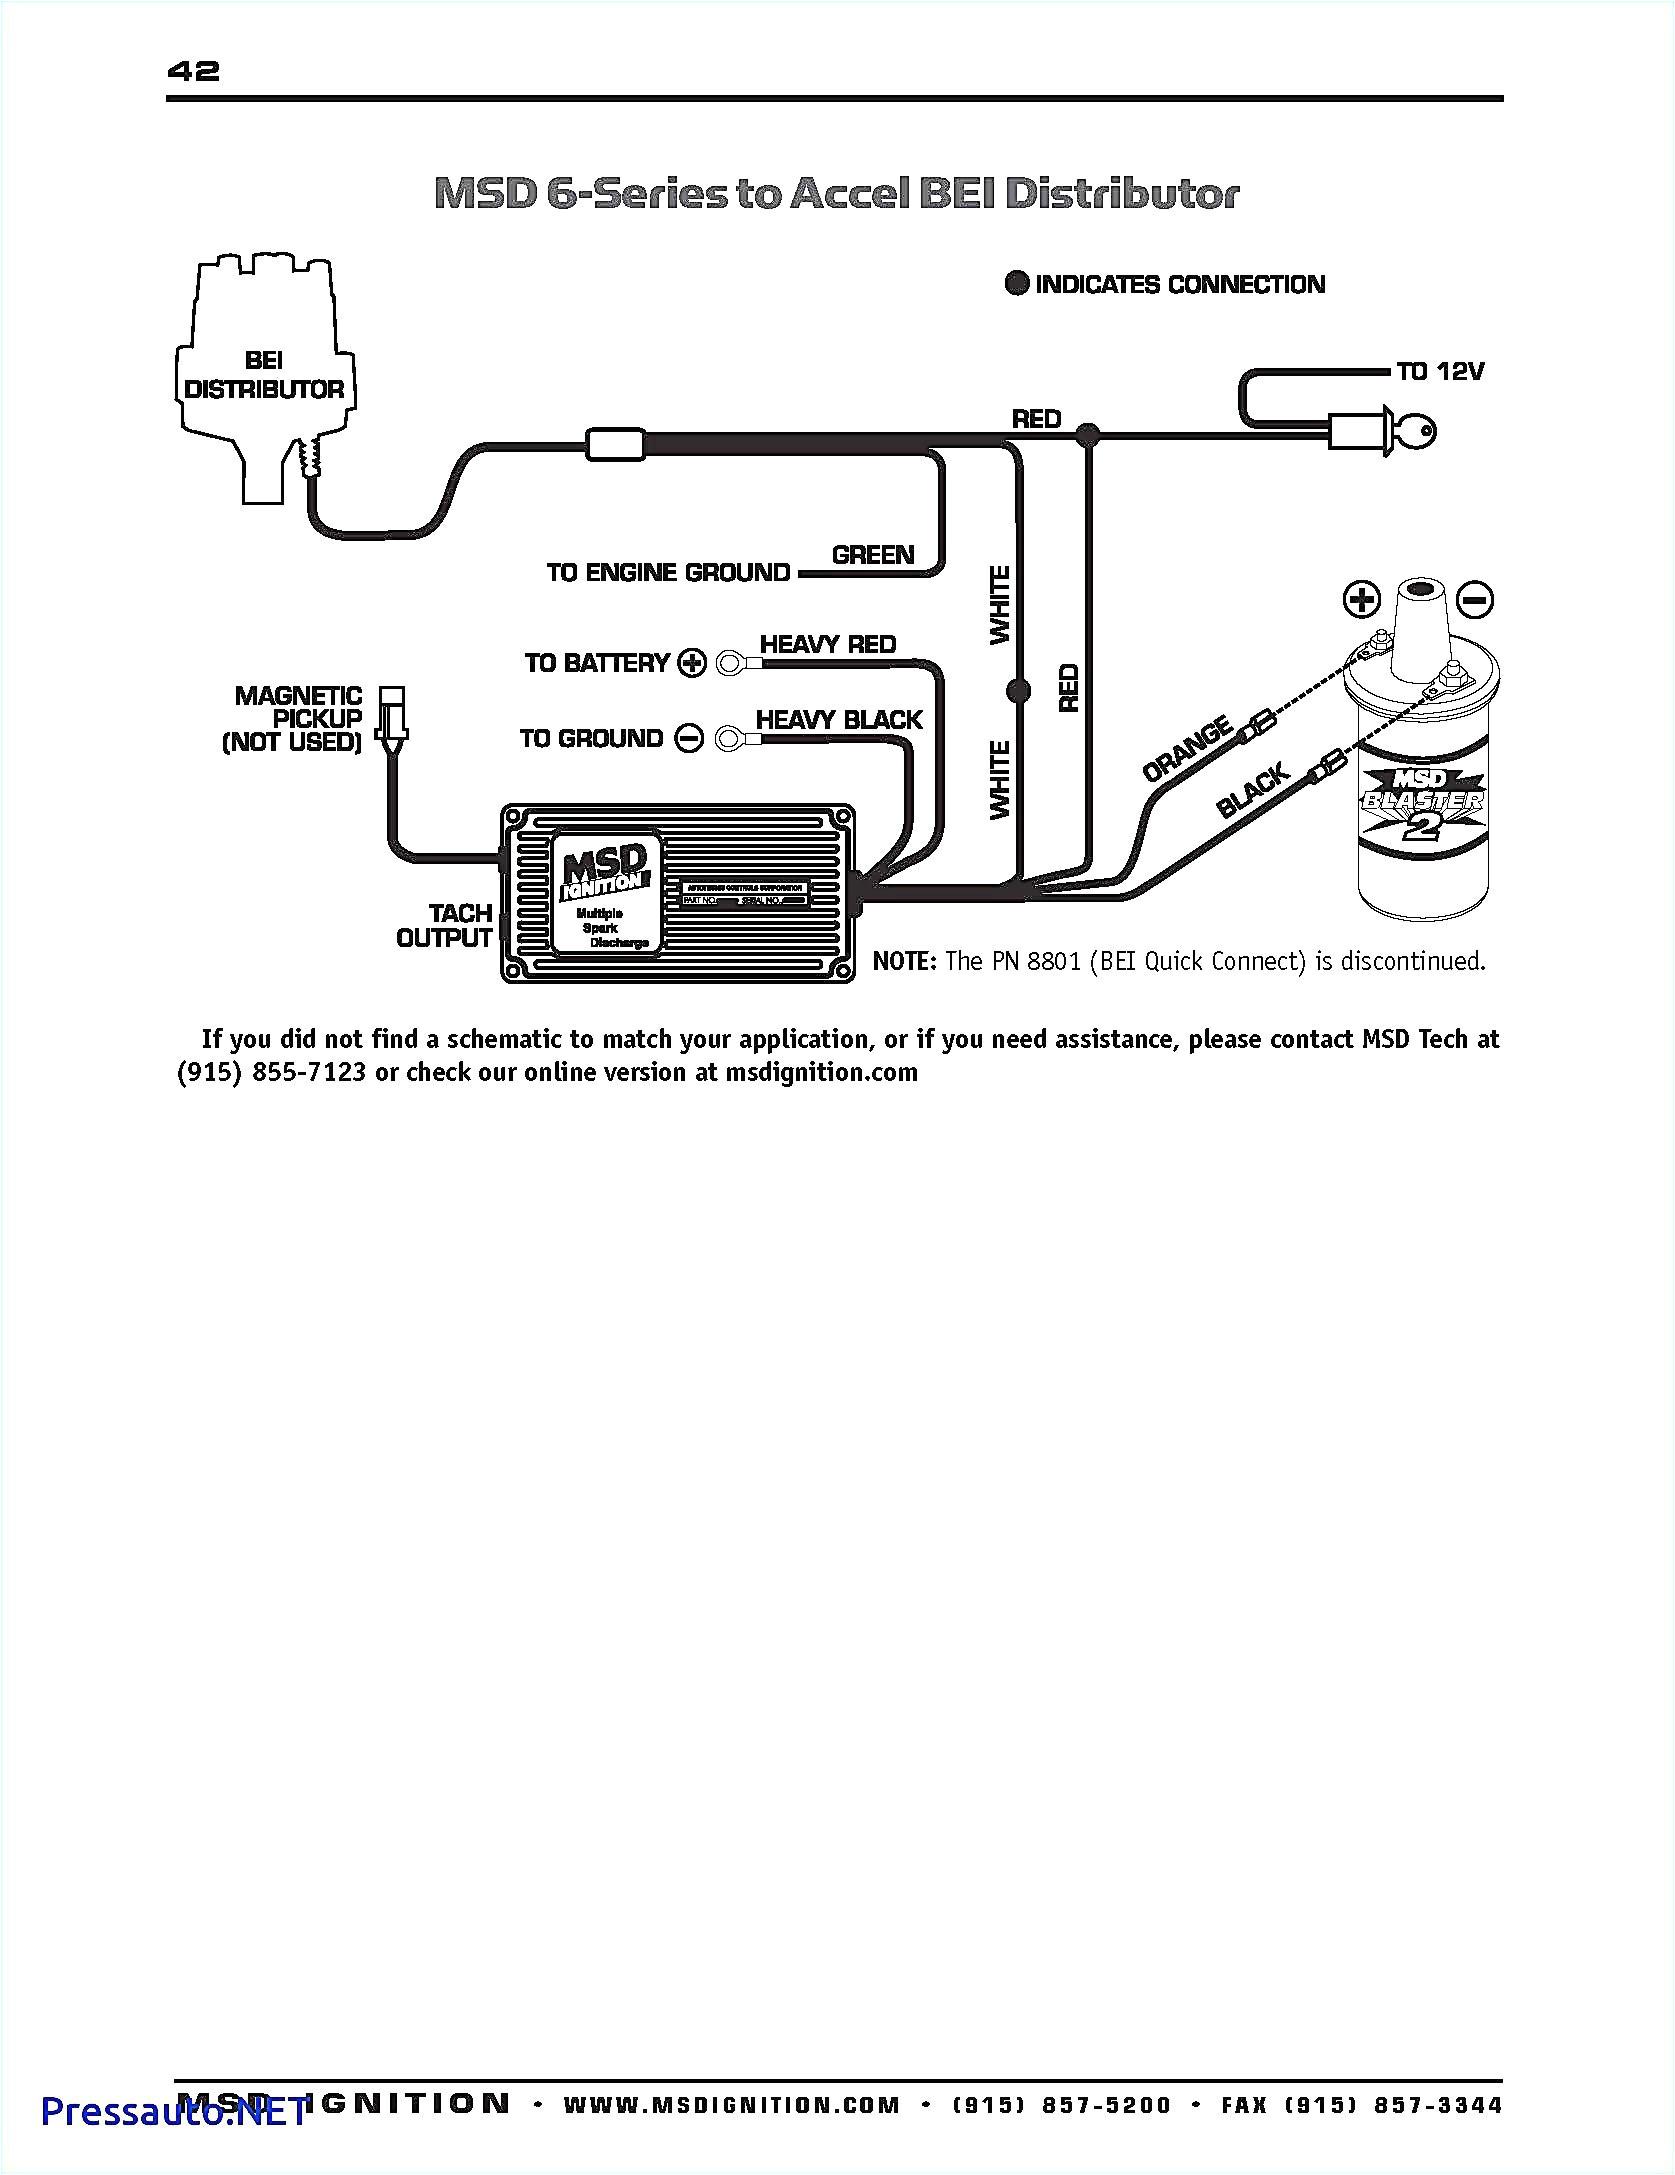 mallory to msd distributor wiring diagram wiring diagram expert mix mallory 6al wiring diagram manual e